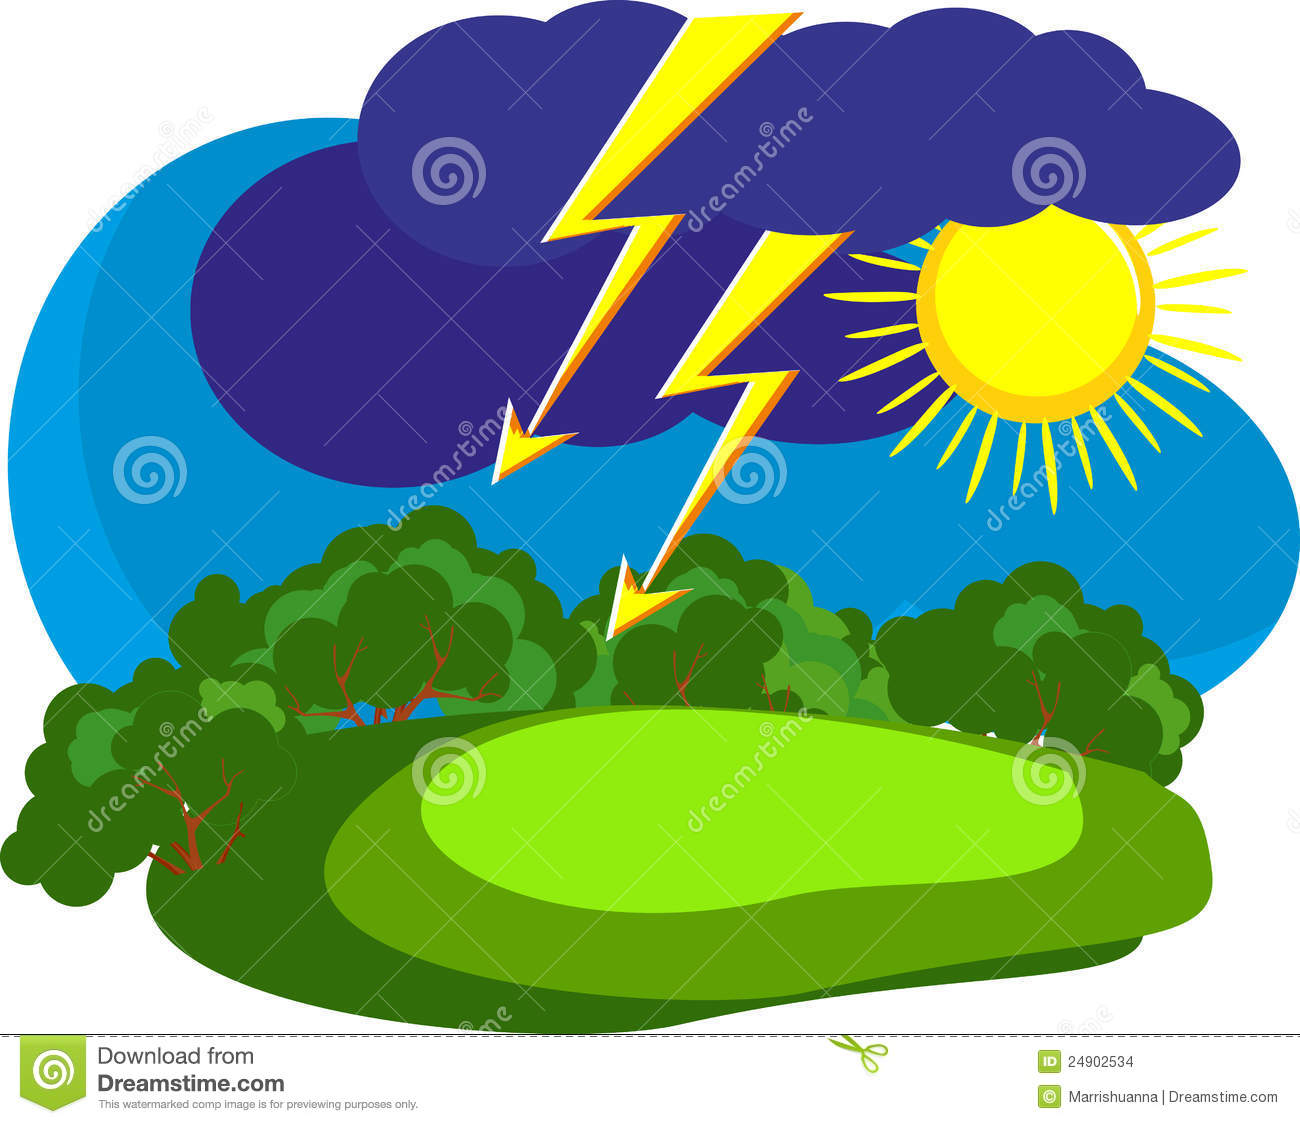 Thunderstorm clipart rainstorm. Summer rain storm in